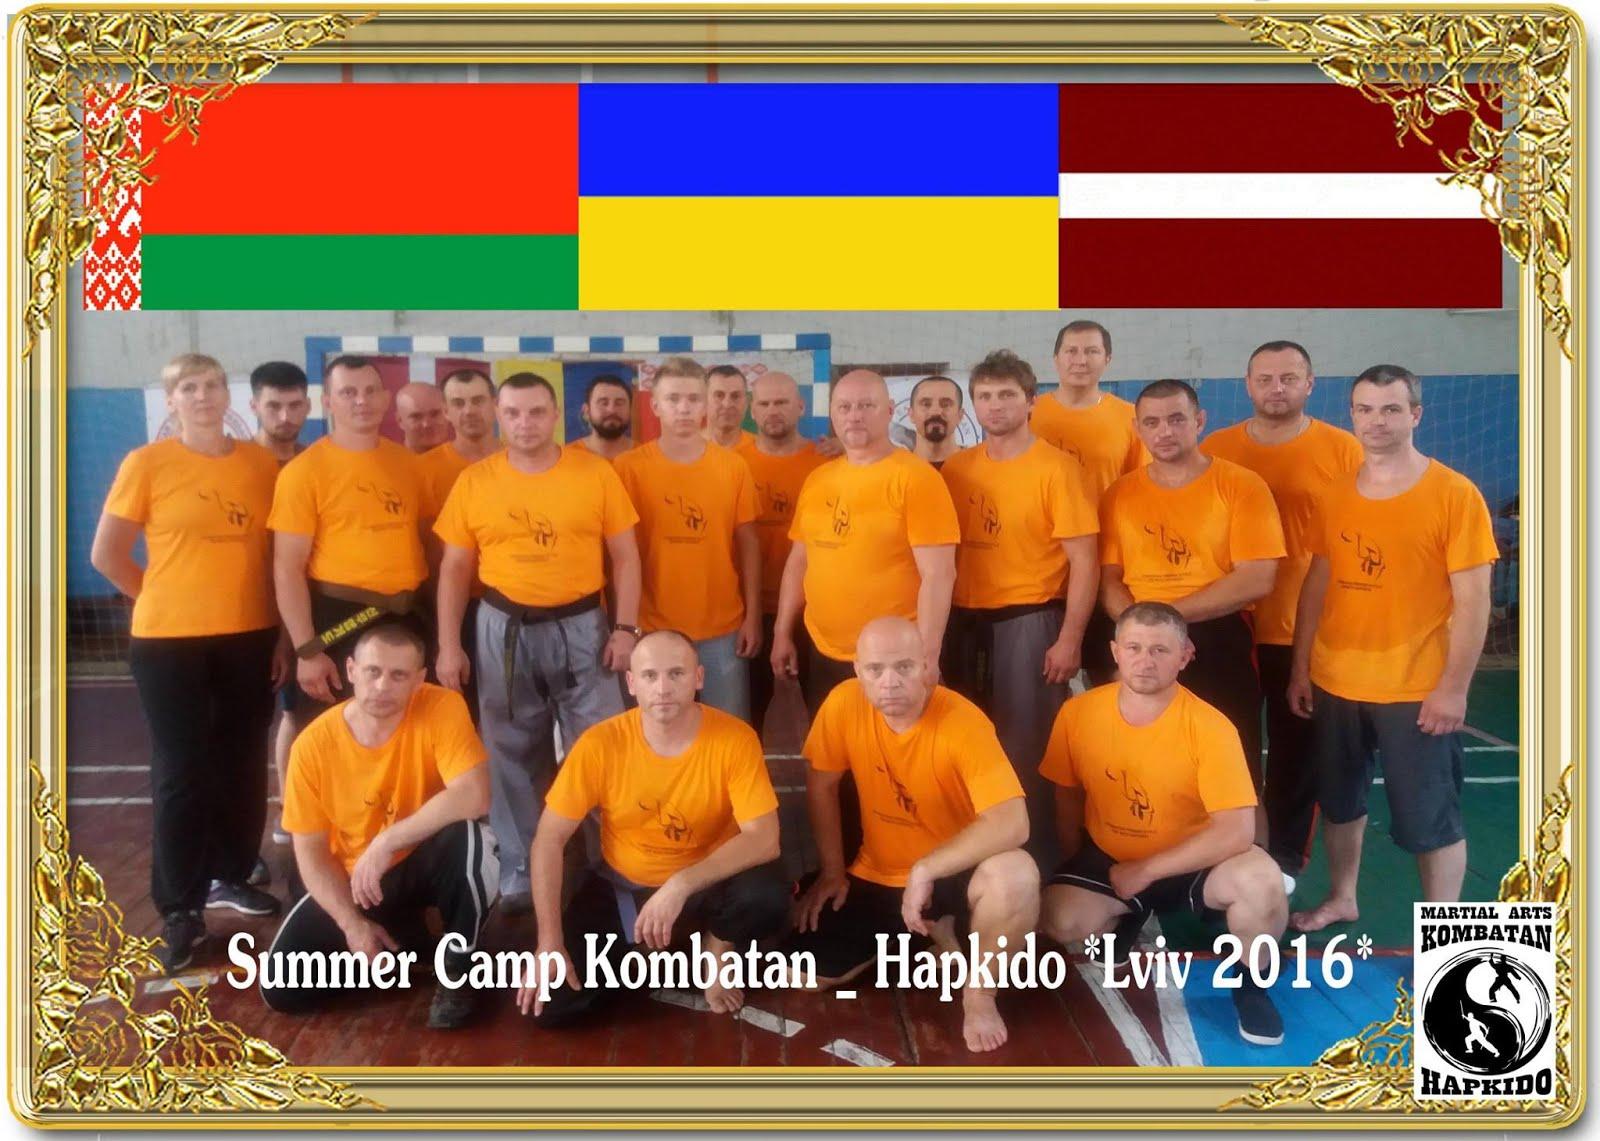 Summer Camp Kombatan _ Hapkido *Lviv 2016*